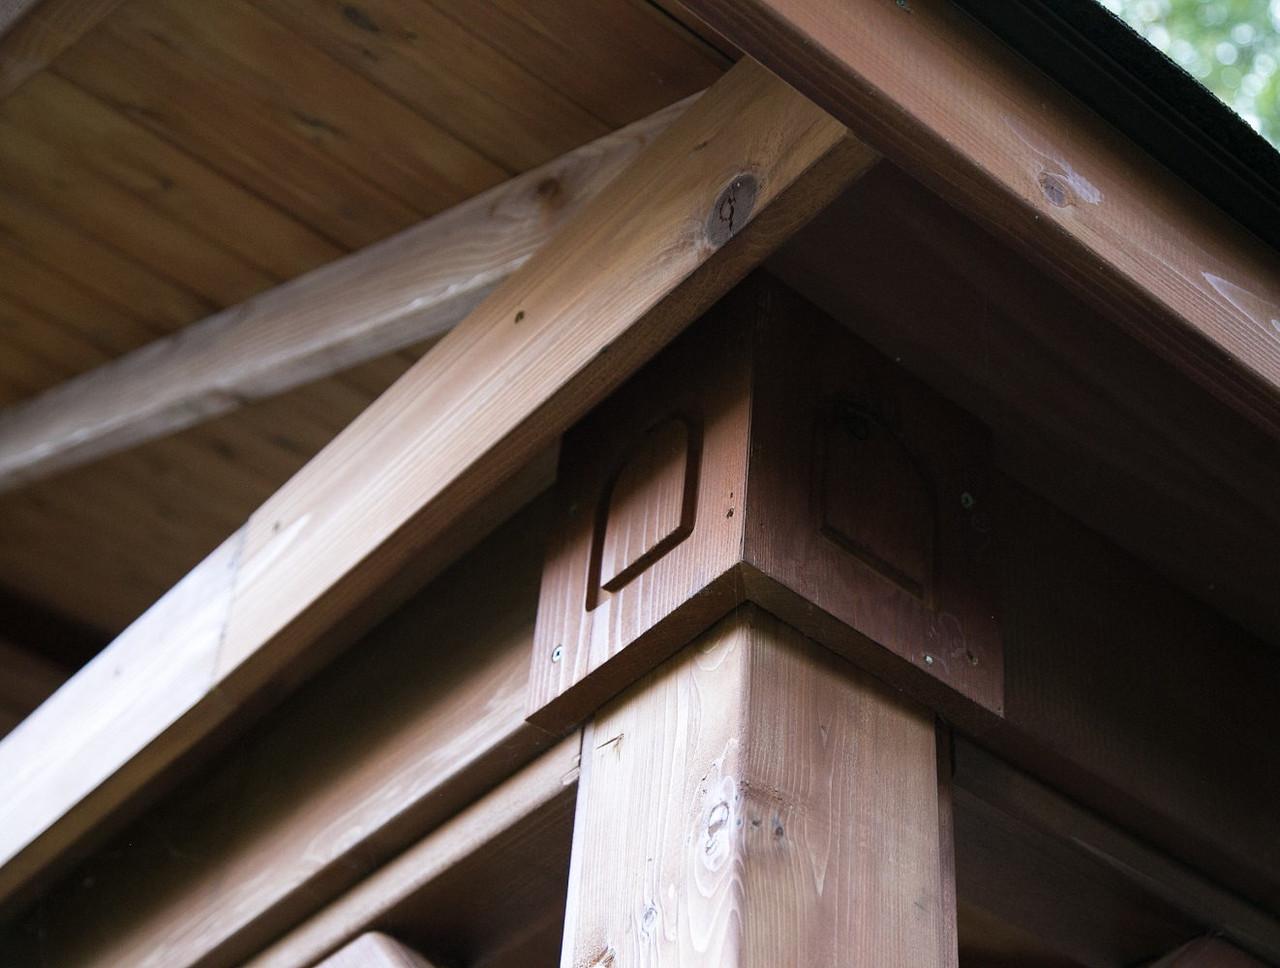 Rustic Details on Open Gable Cedar Pavilion, Sewickley, PA